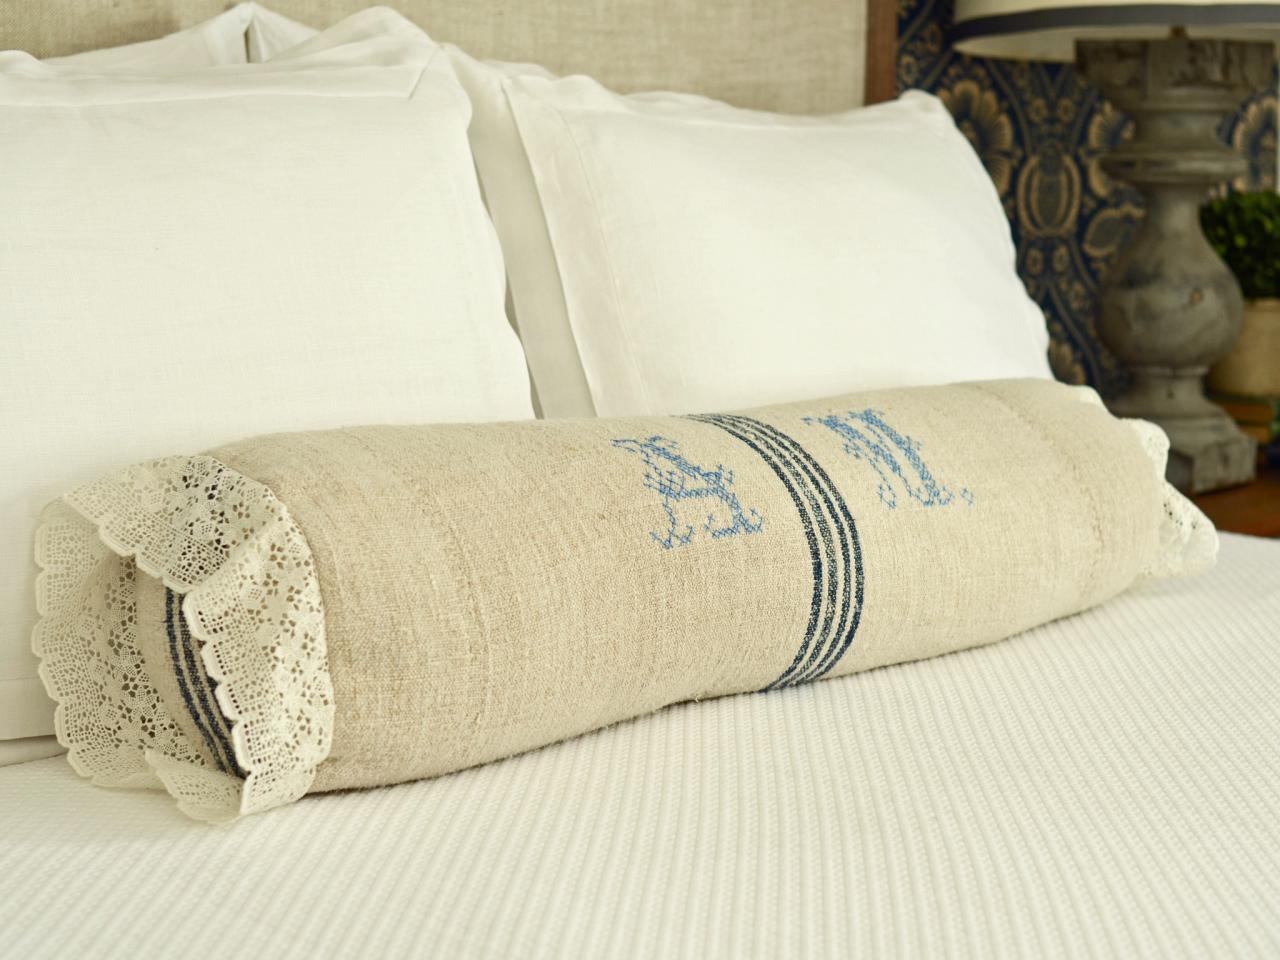 Подушка-валик в стиле кантри